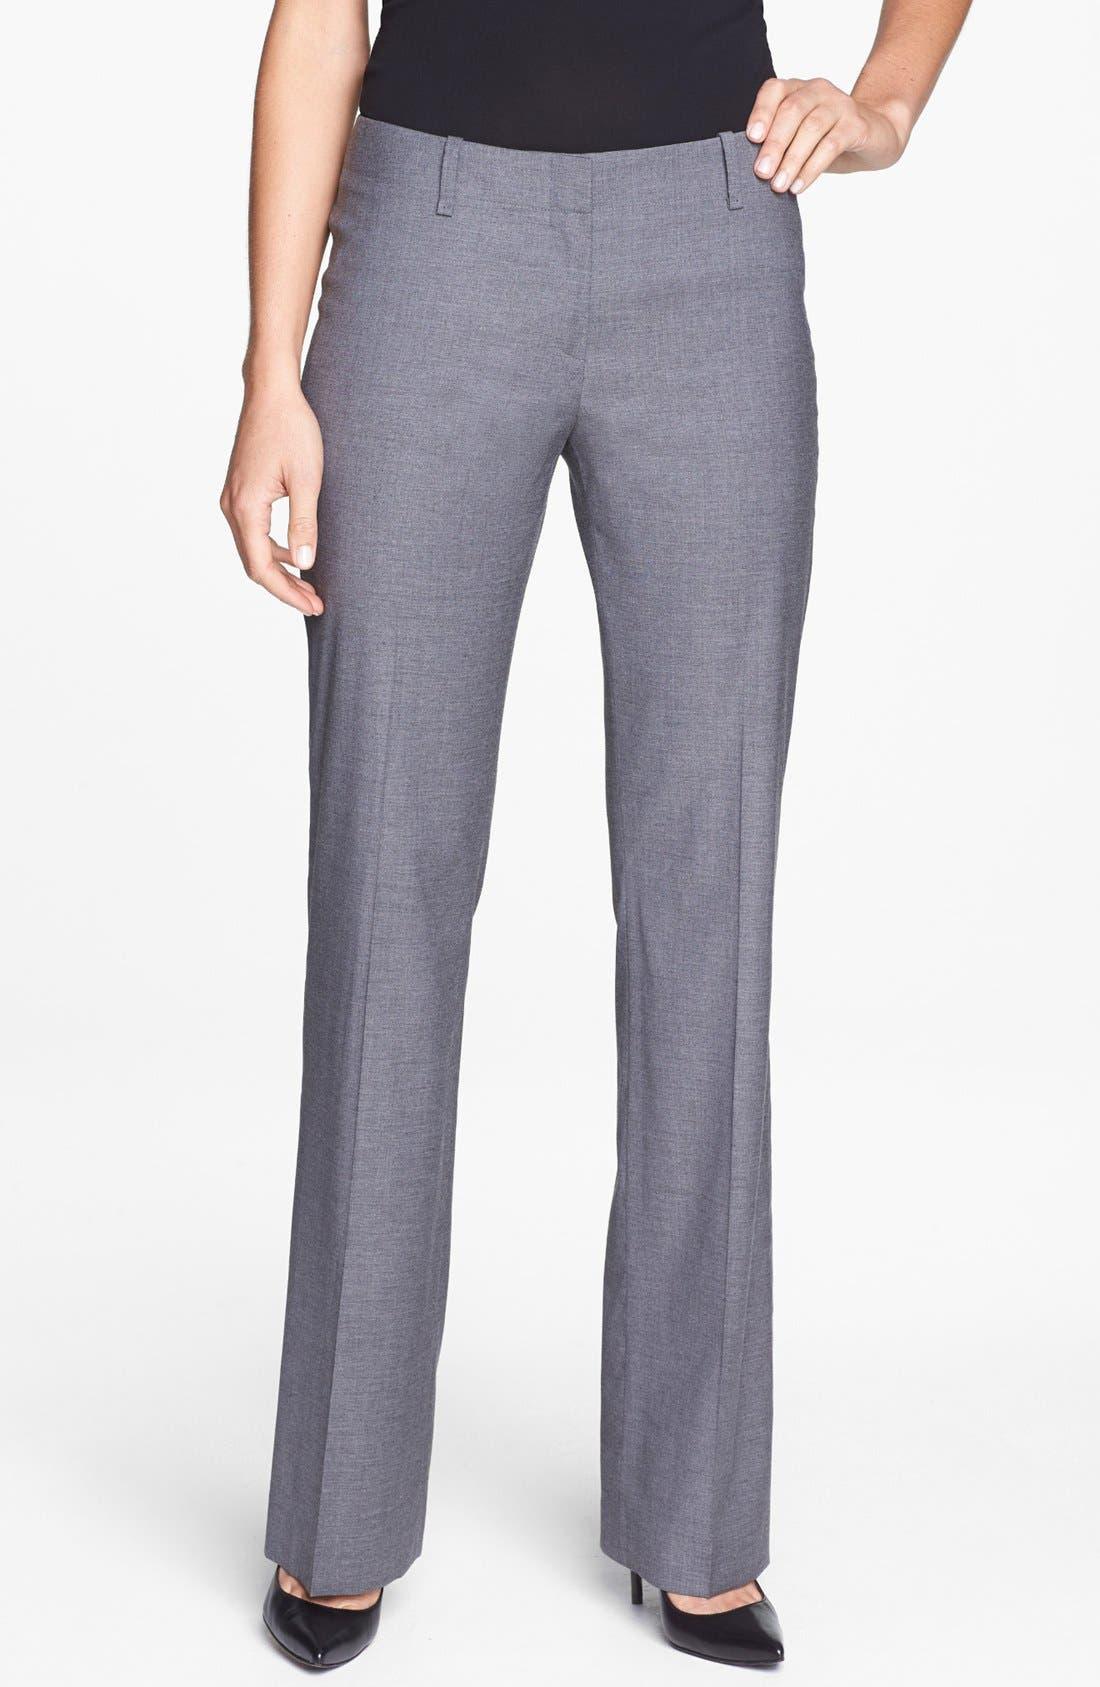 Alternate Image 1 Selected - BOSS 'Tulia4' Trousers